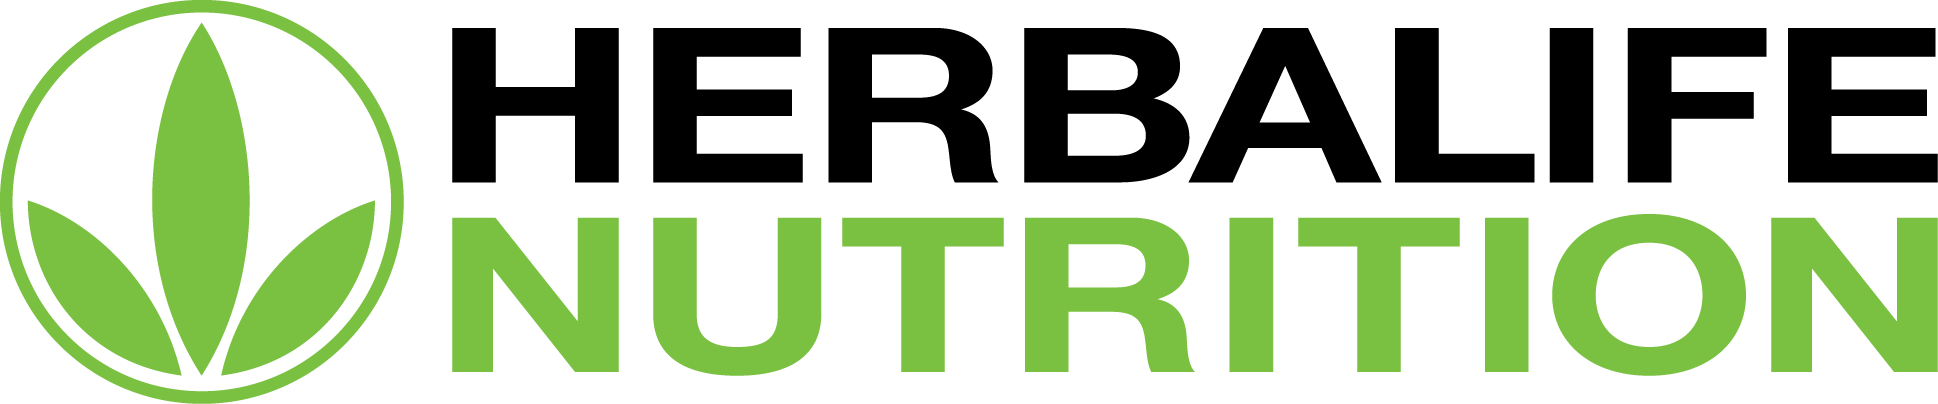 Herbalife_Nutrition_Logo_2016.png